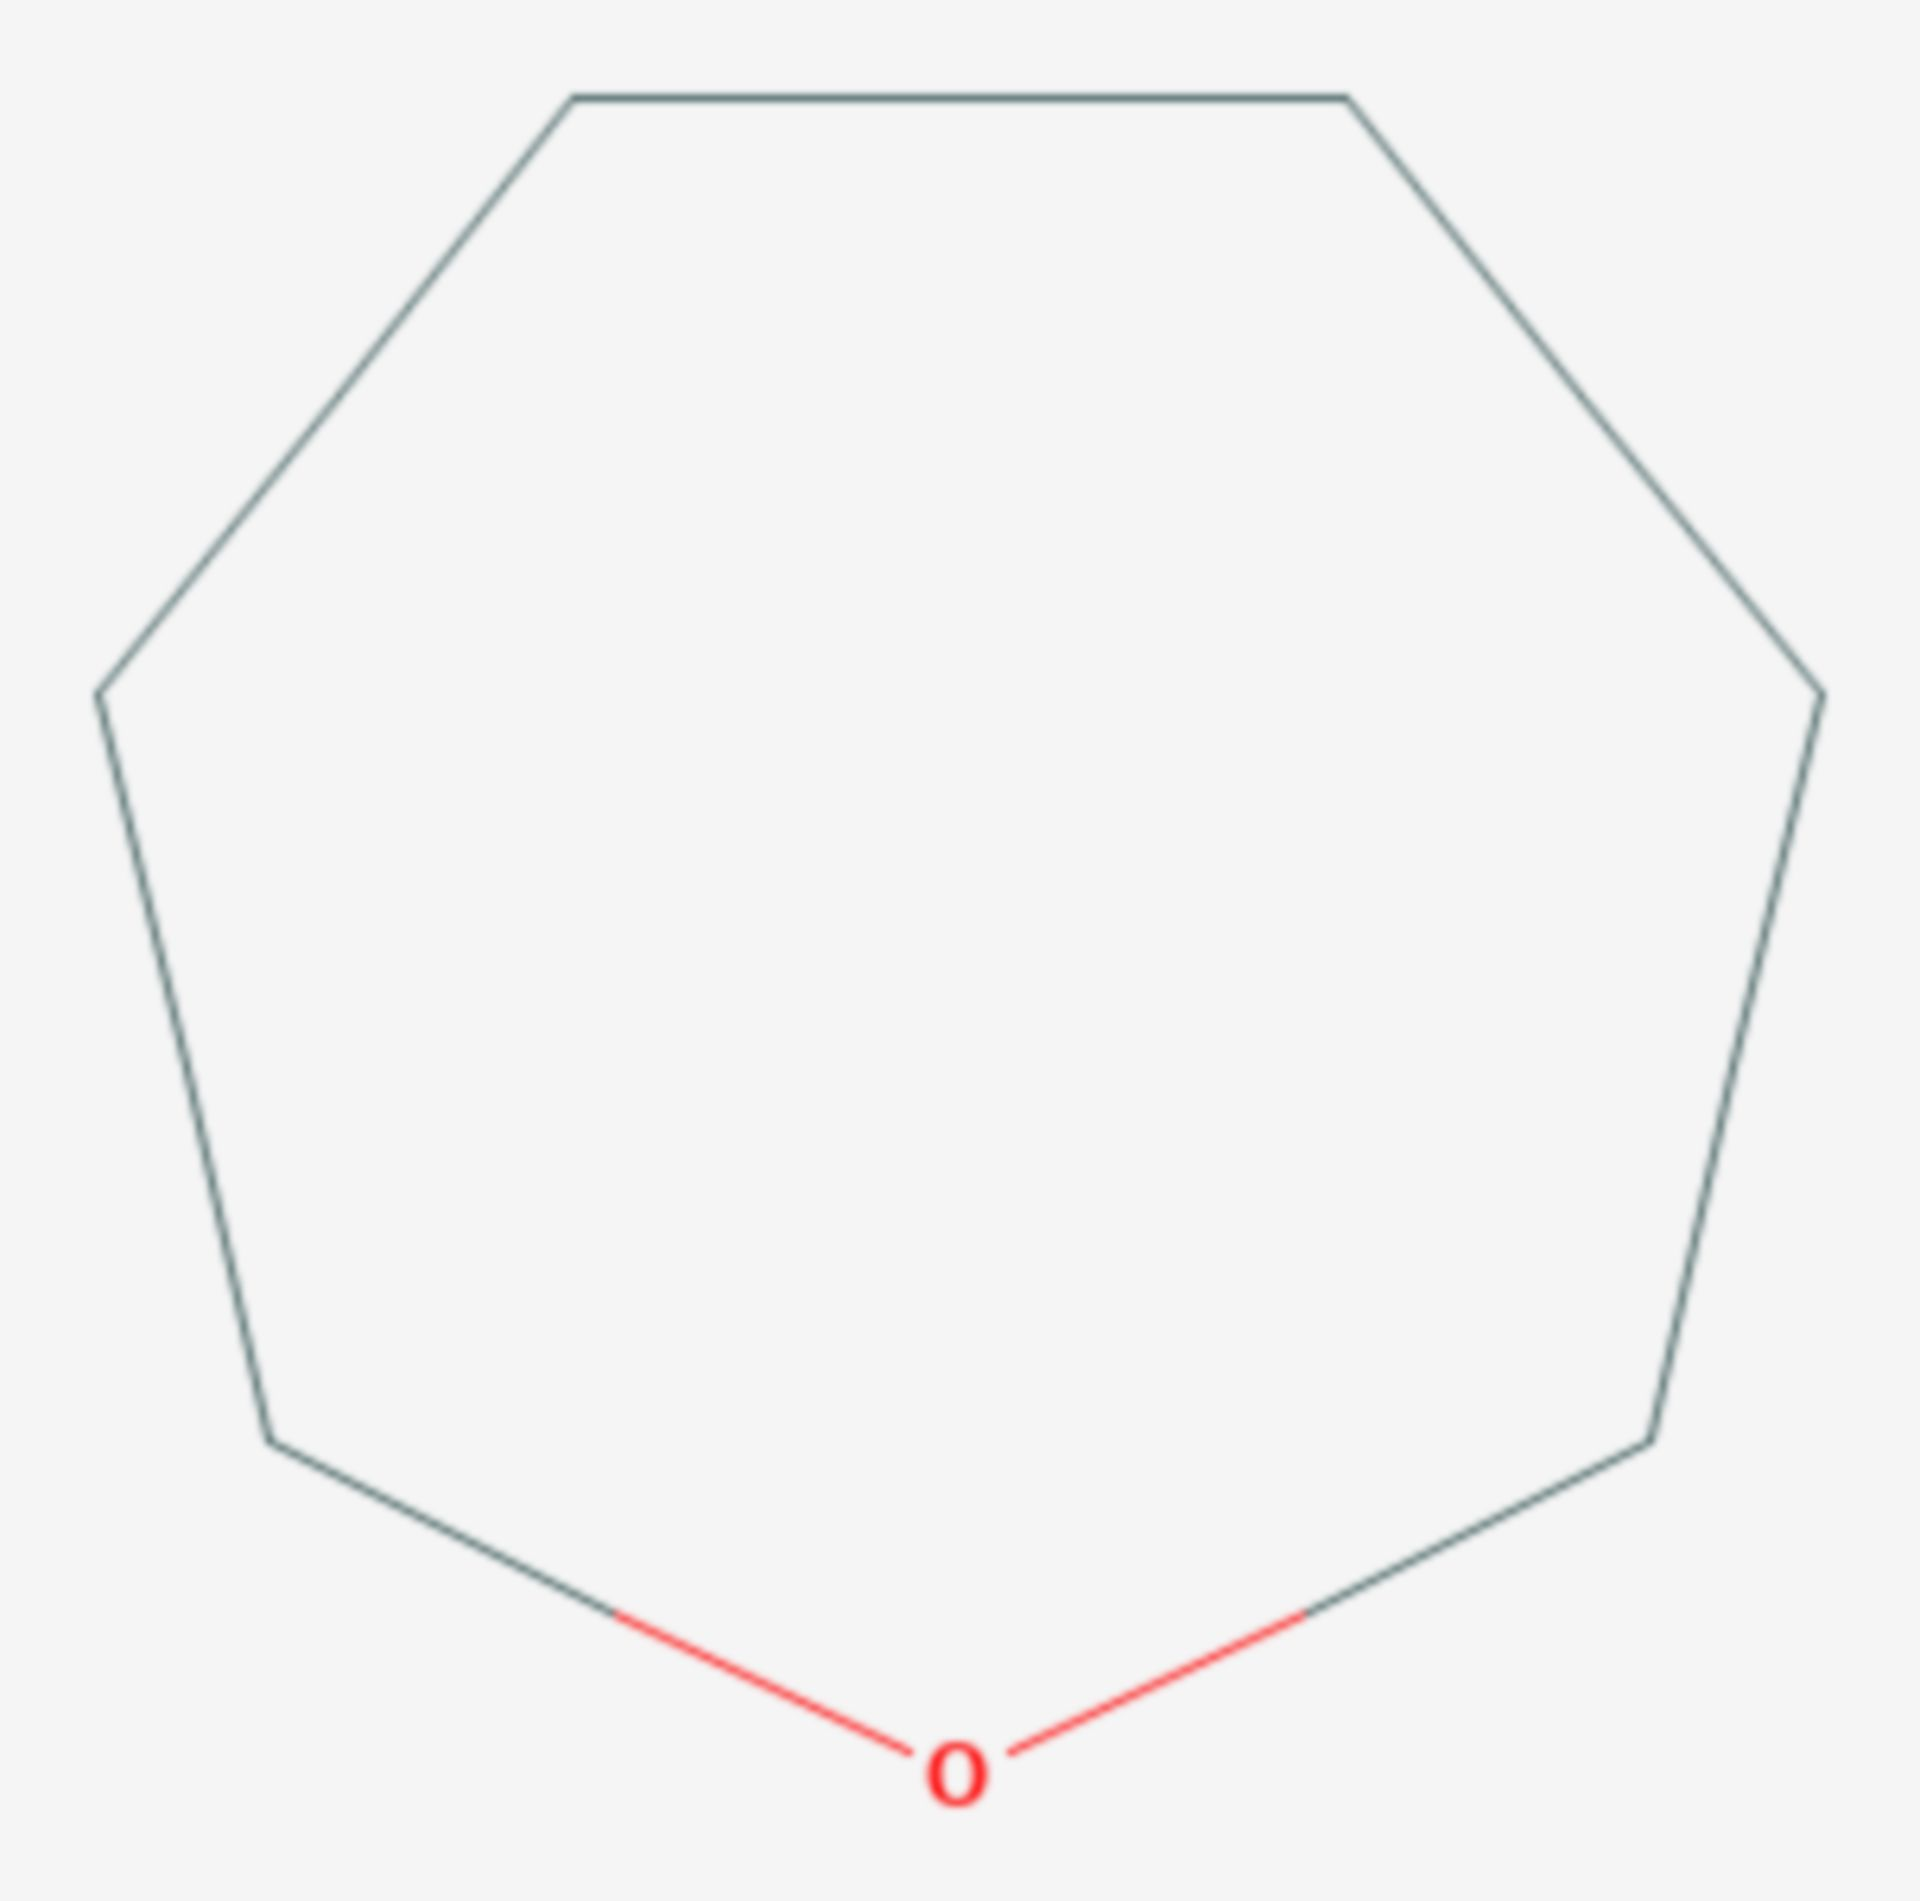 Oxepan (Strukturformel)